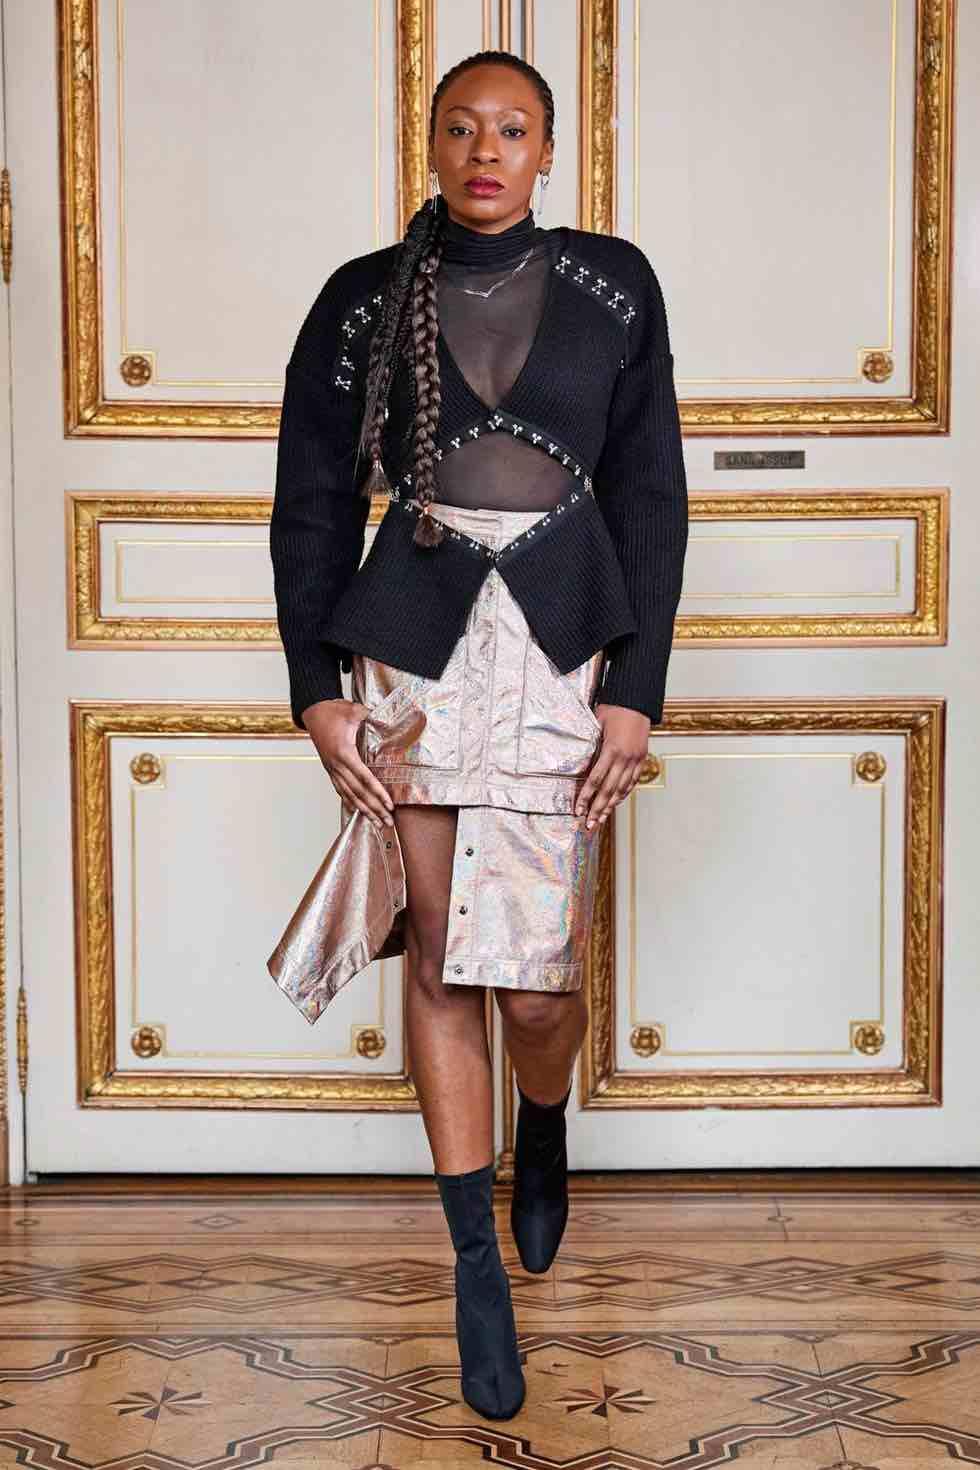 acconciatura trecce modella paris fashion week 2020